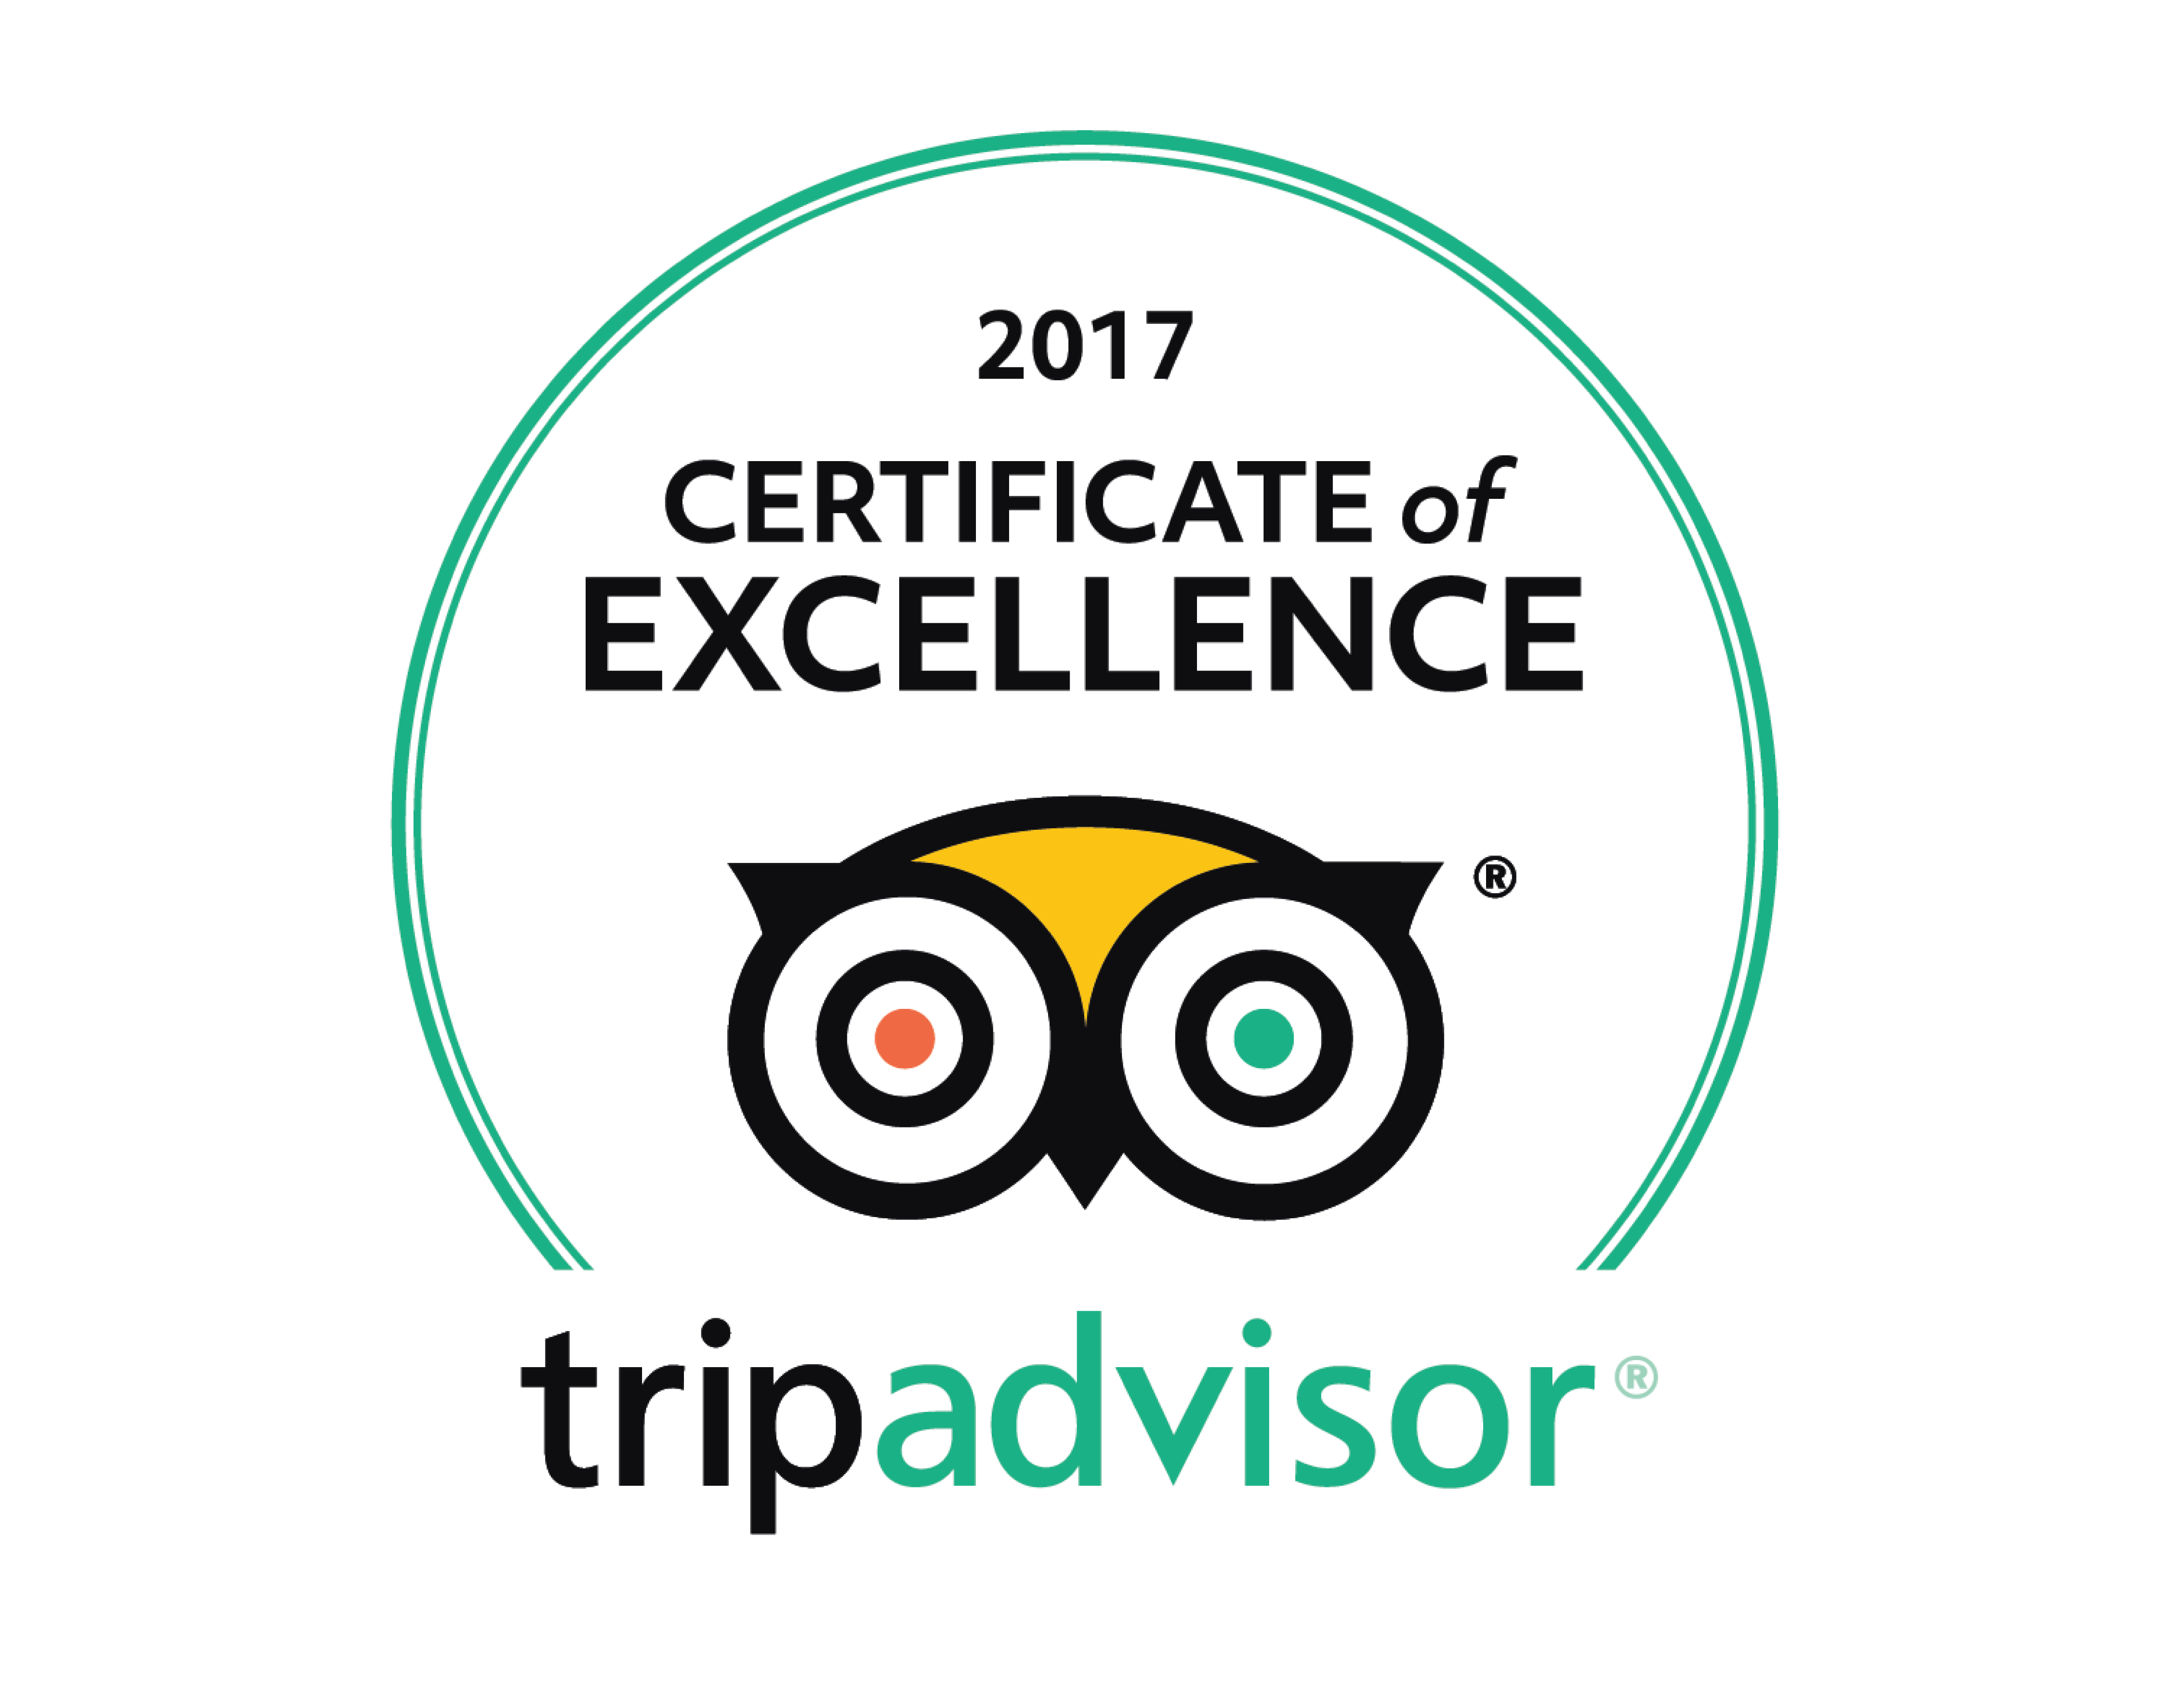 tripadvisor 2017, certificate of excellence, Guam's #1 tours, Valley of the latte adventure park